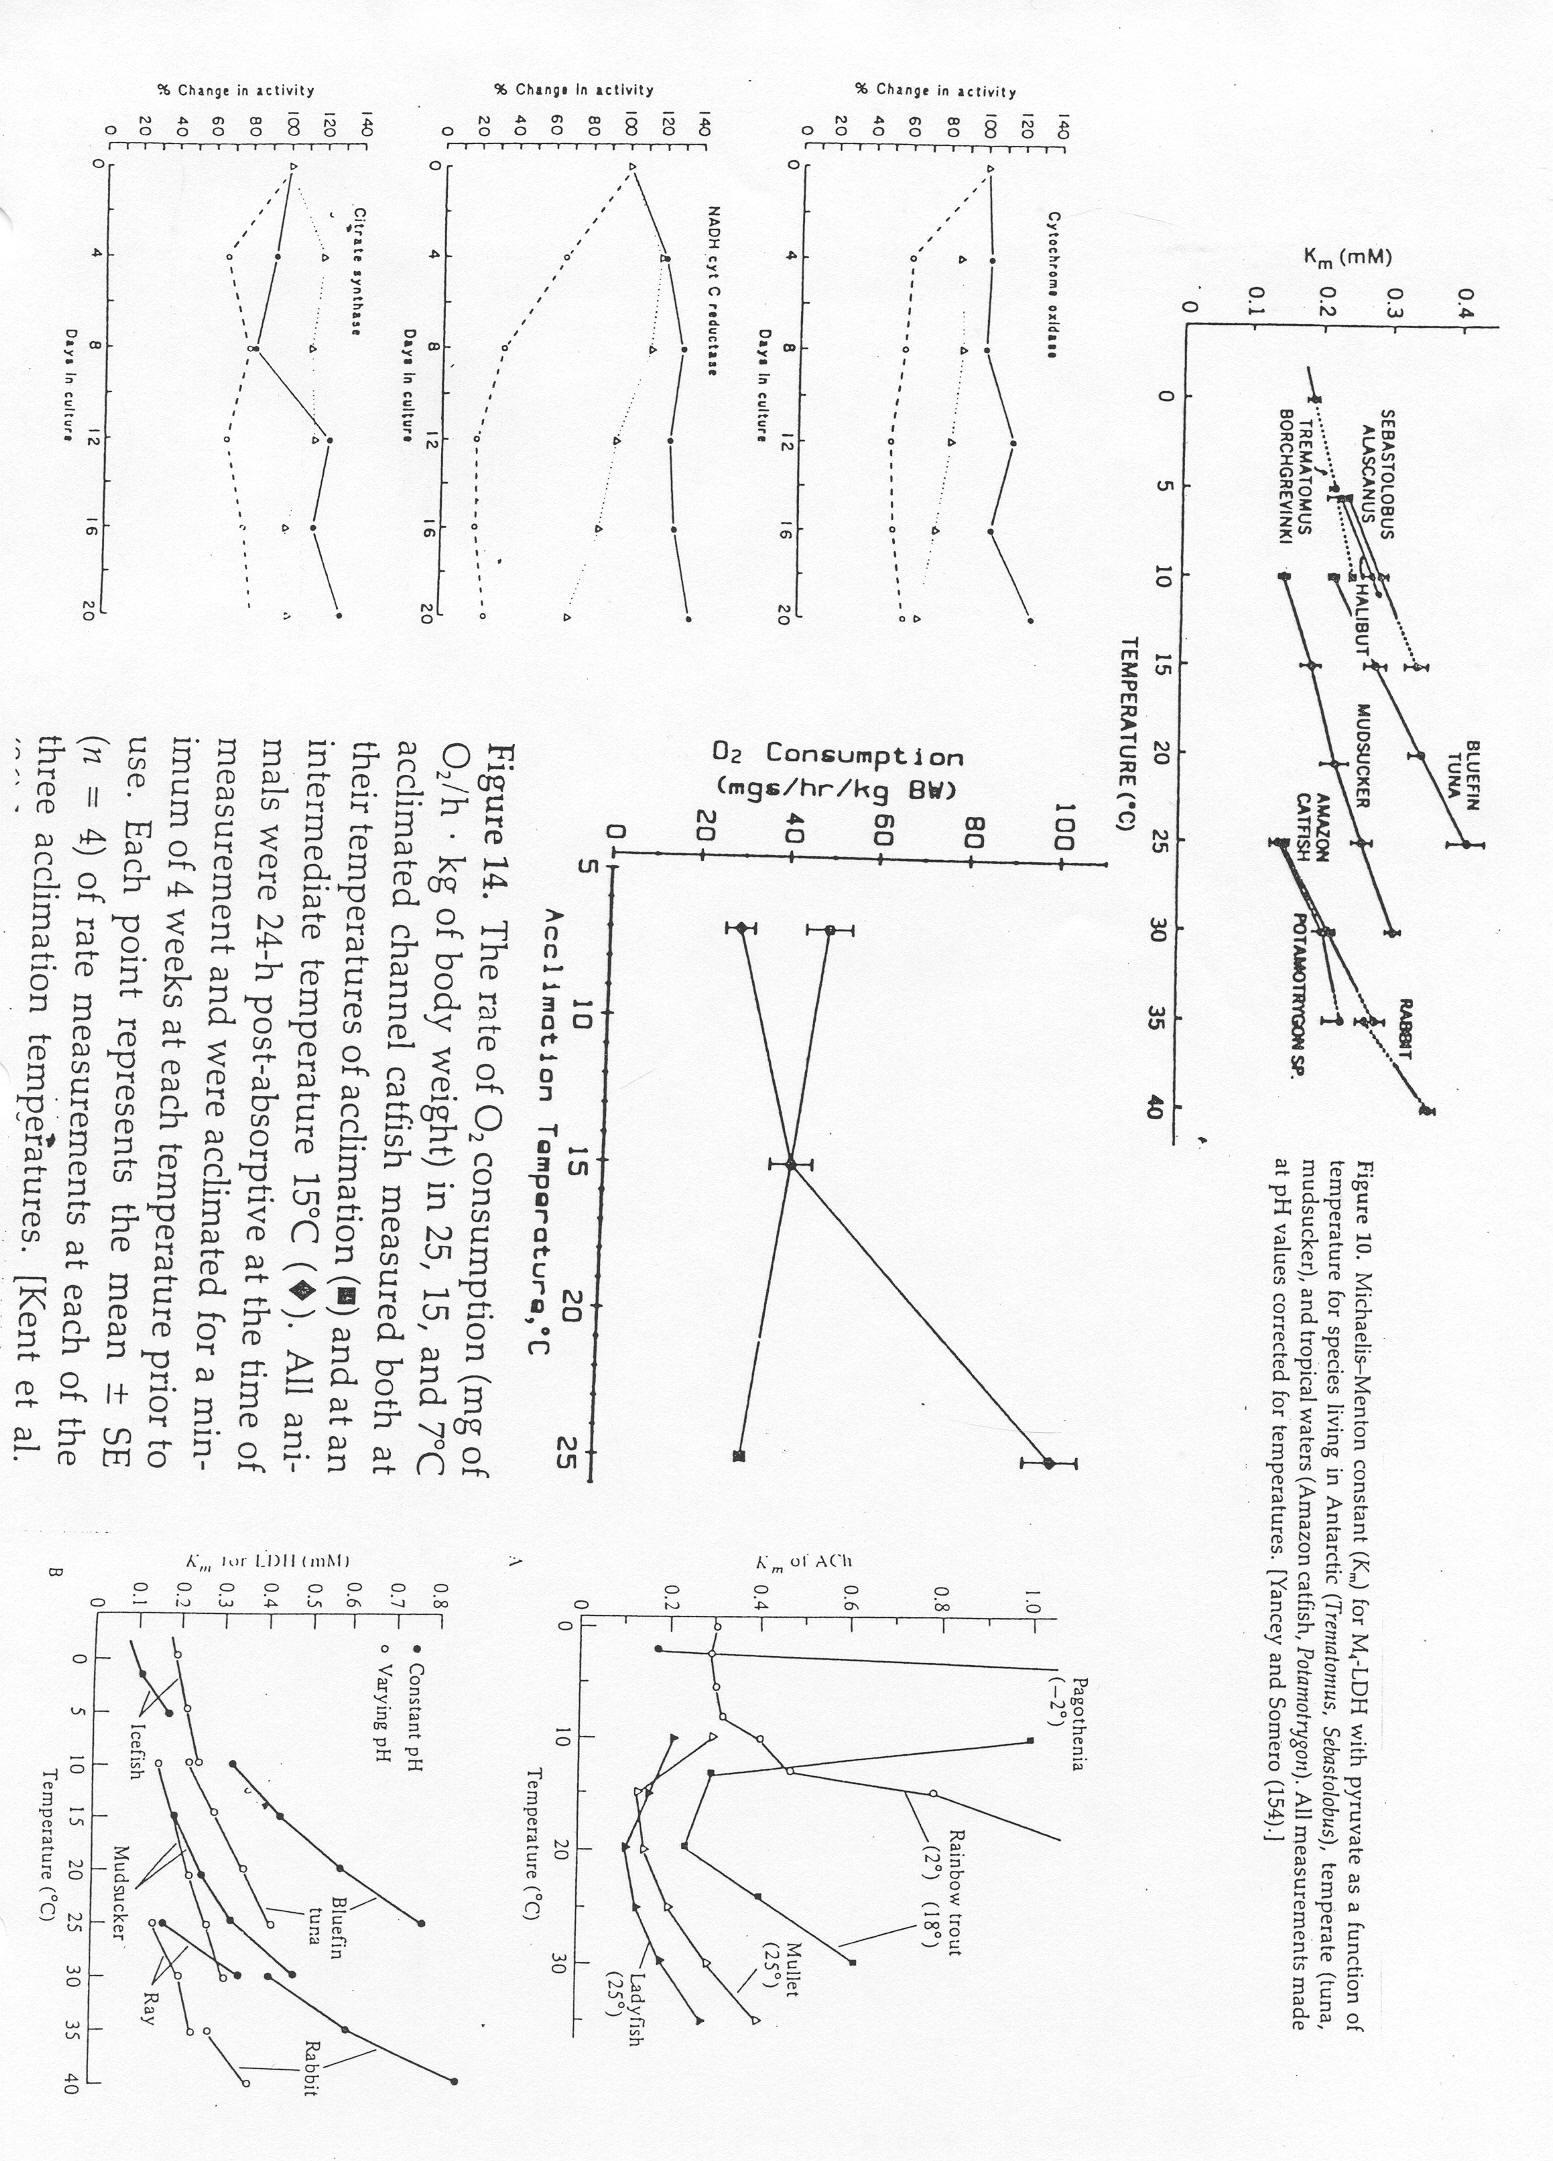 2006 Syllabus: Environmental Physiology